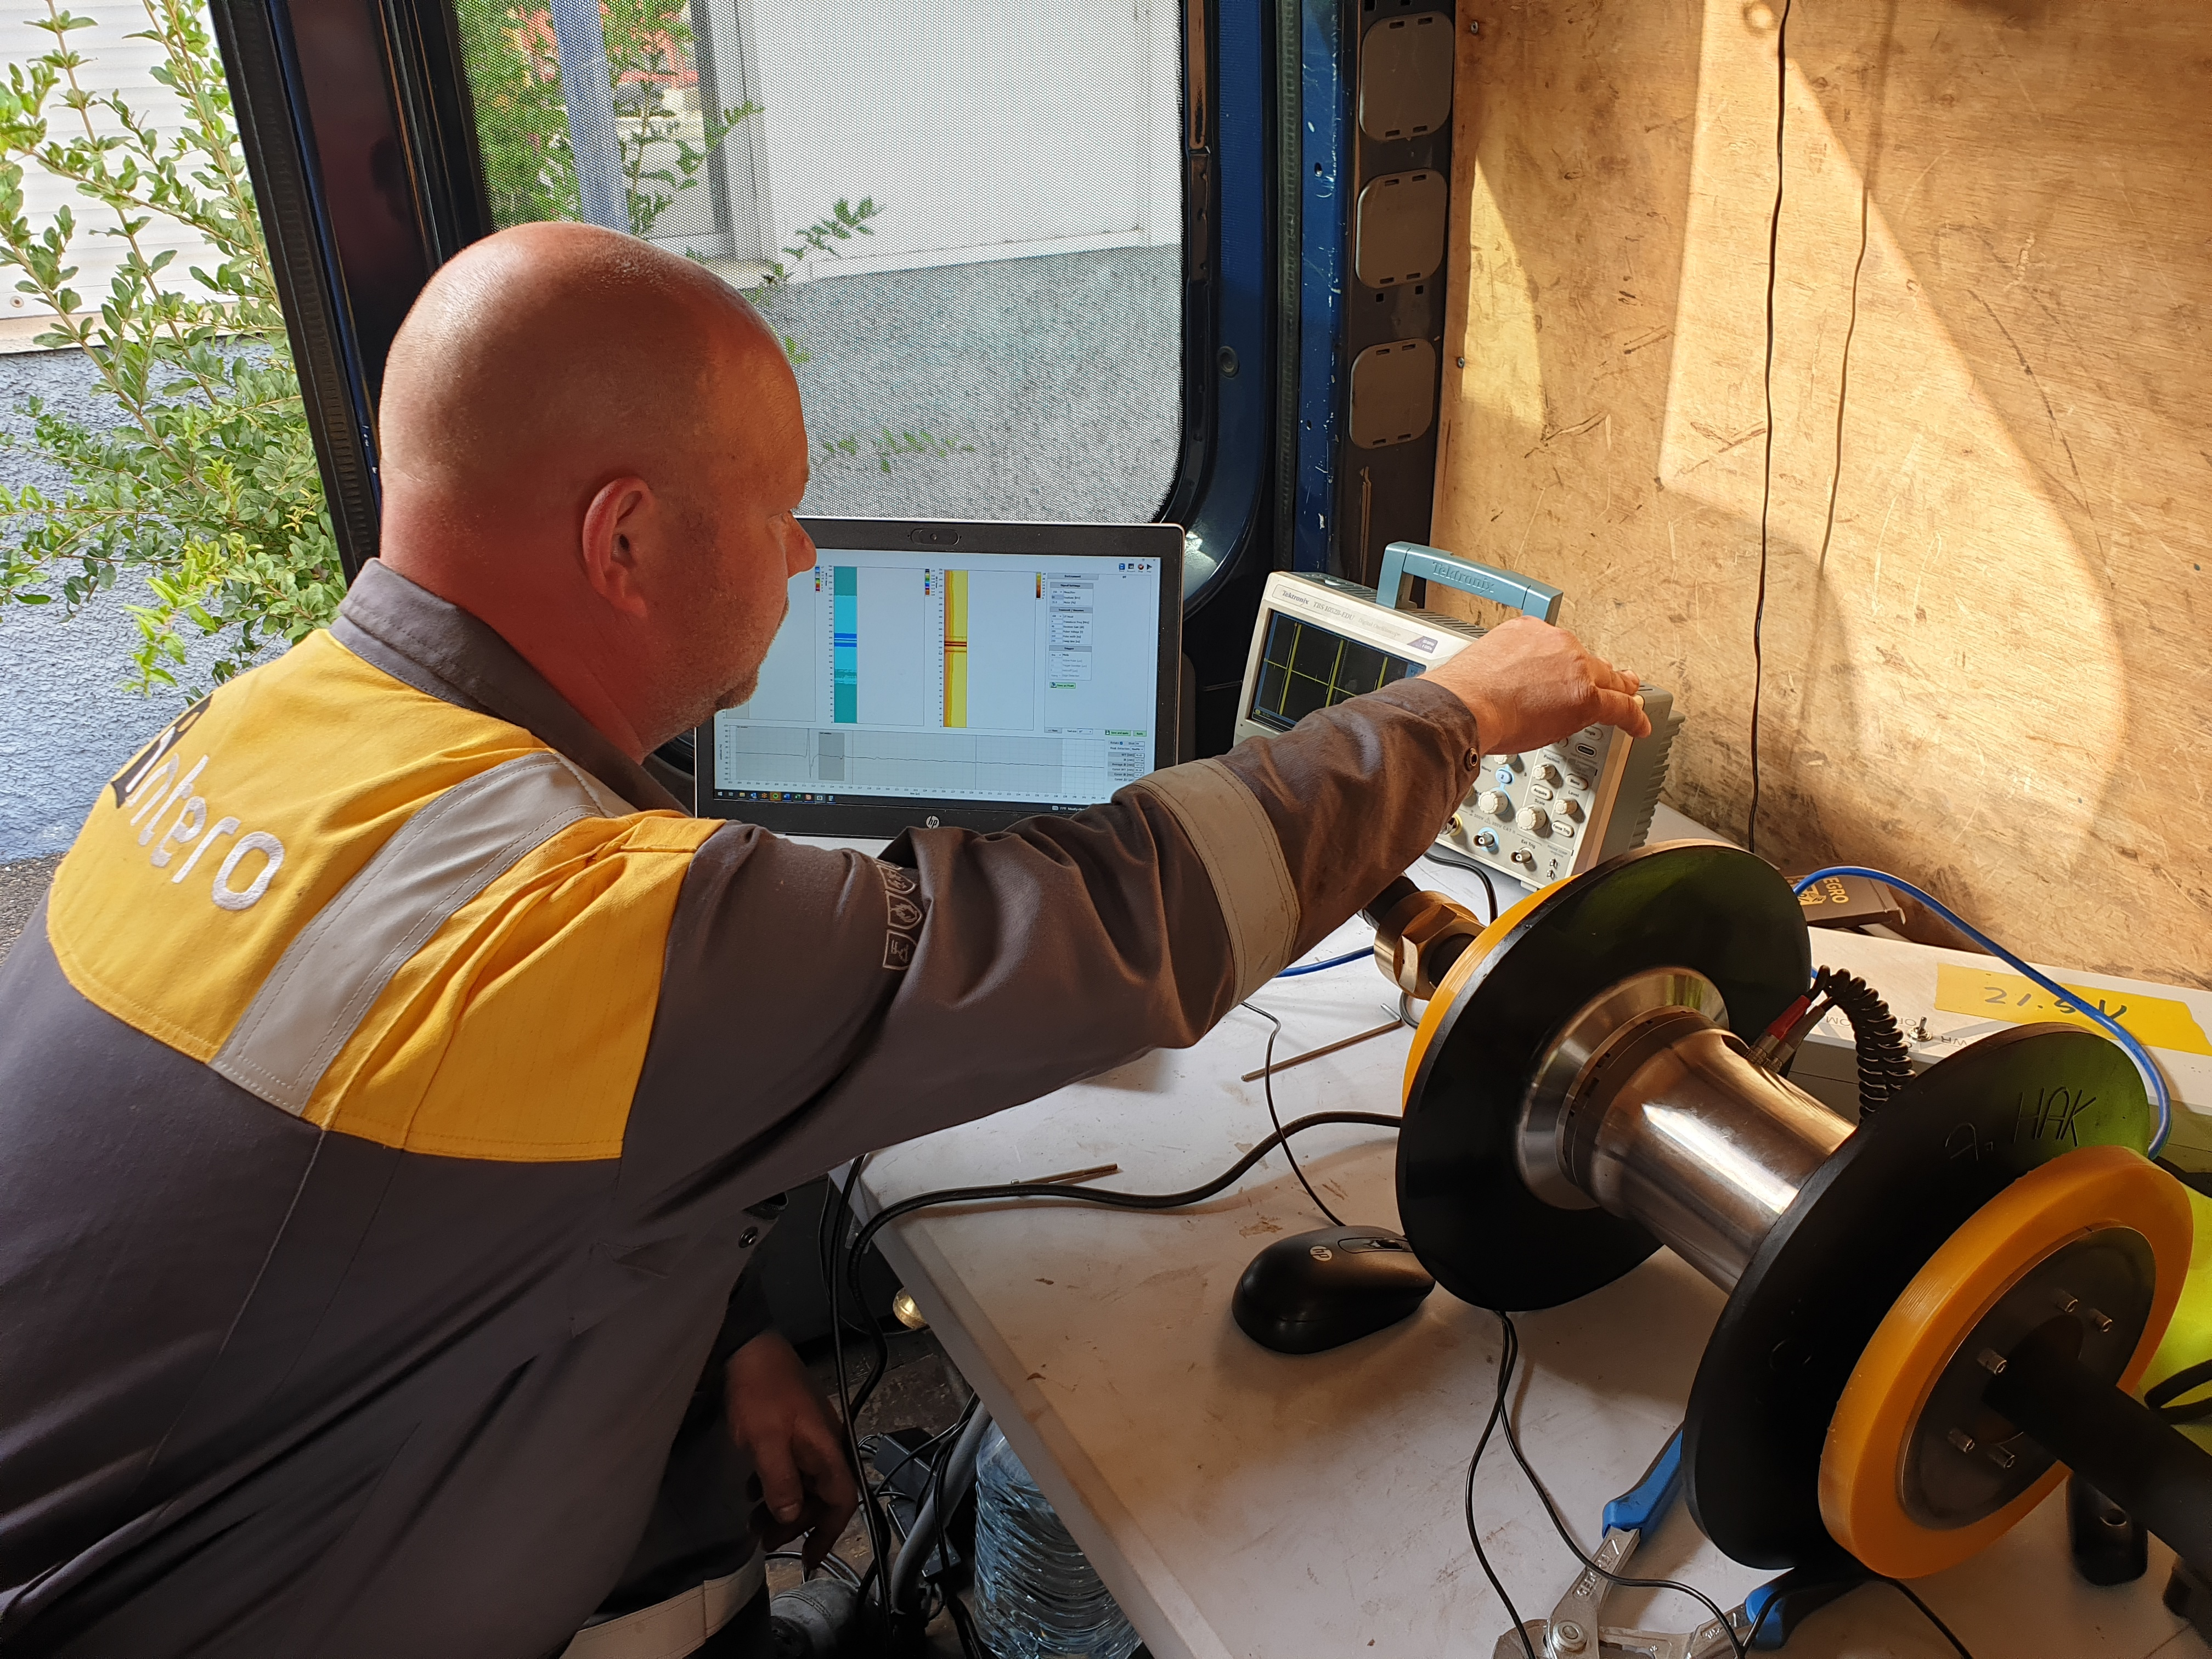 Engineer prepares the Pipeline Surveyor for inspection